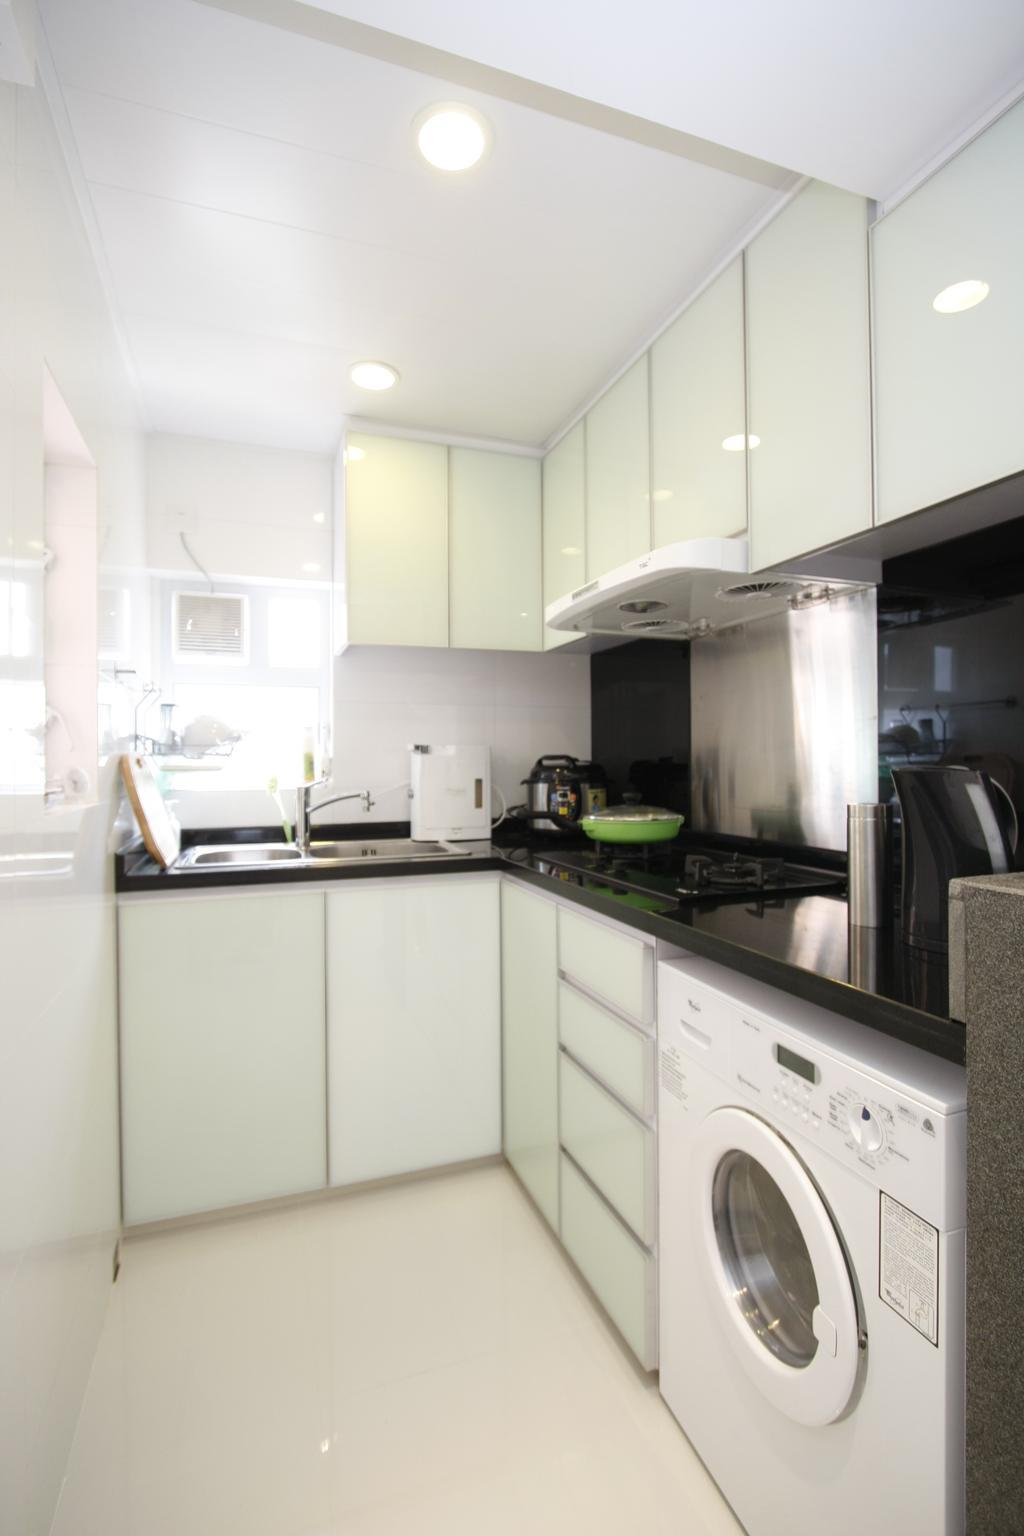 摩登, 私家樓, 黃金海岸, 室內設計師, 和生設計, Indoors, Interior Design, 廚房, Room, Sink